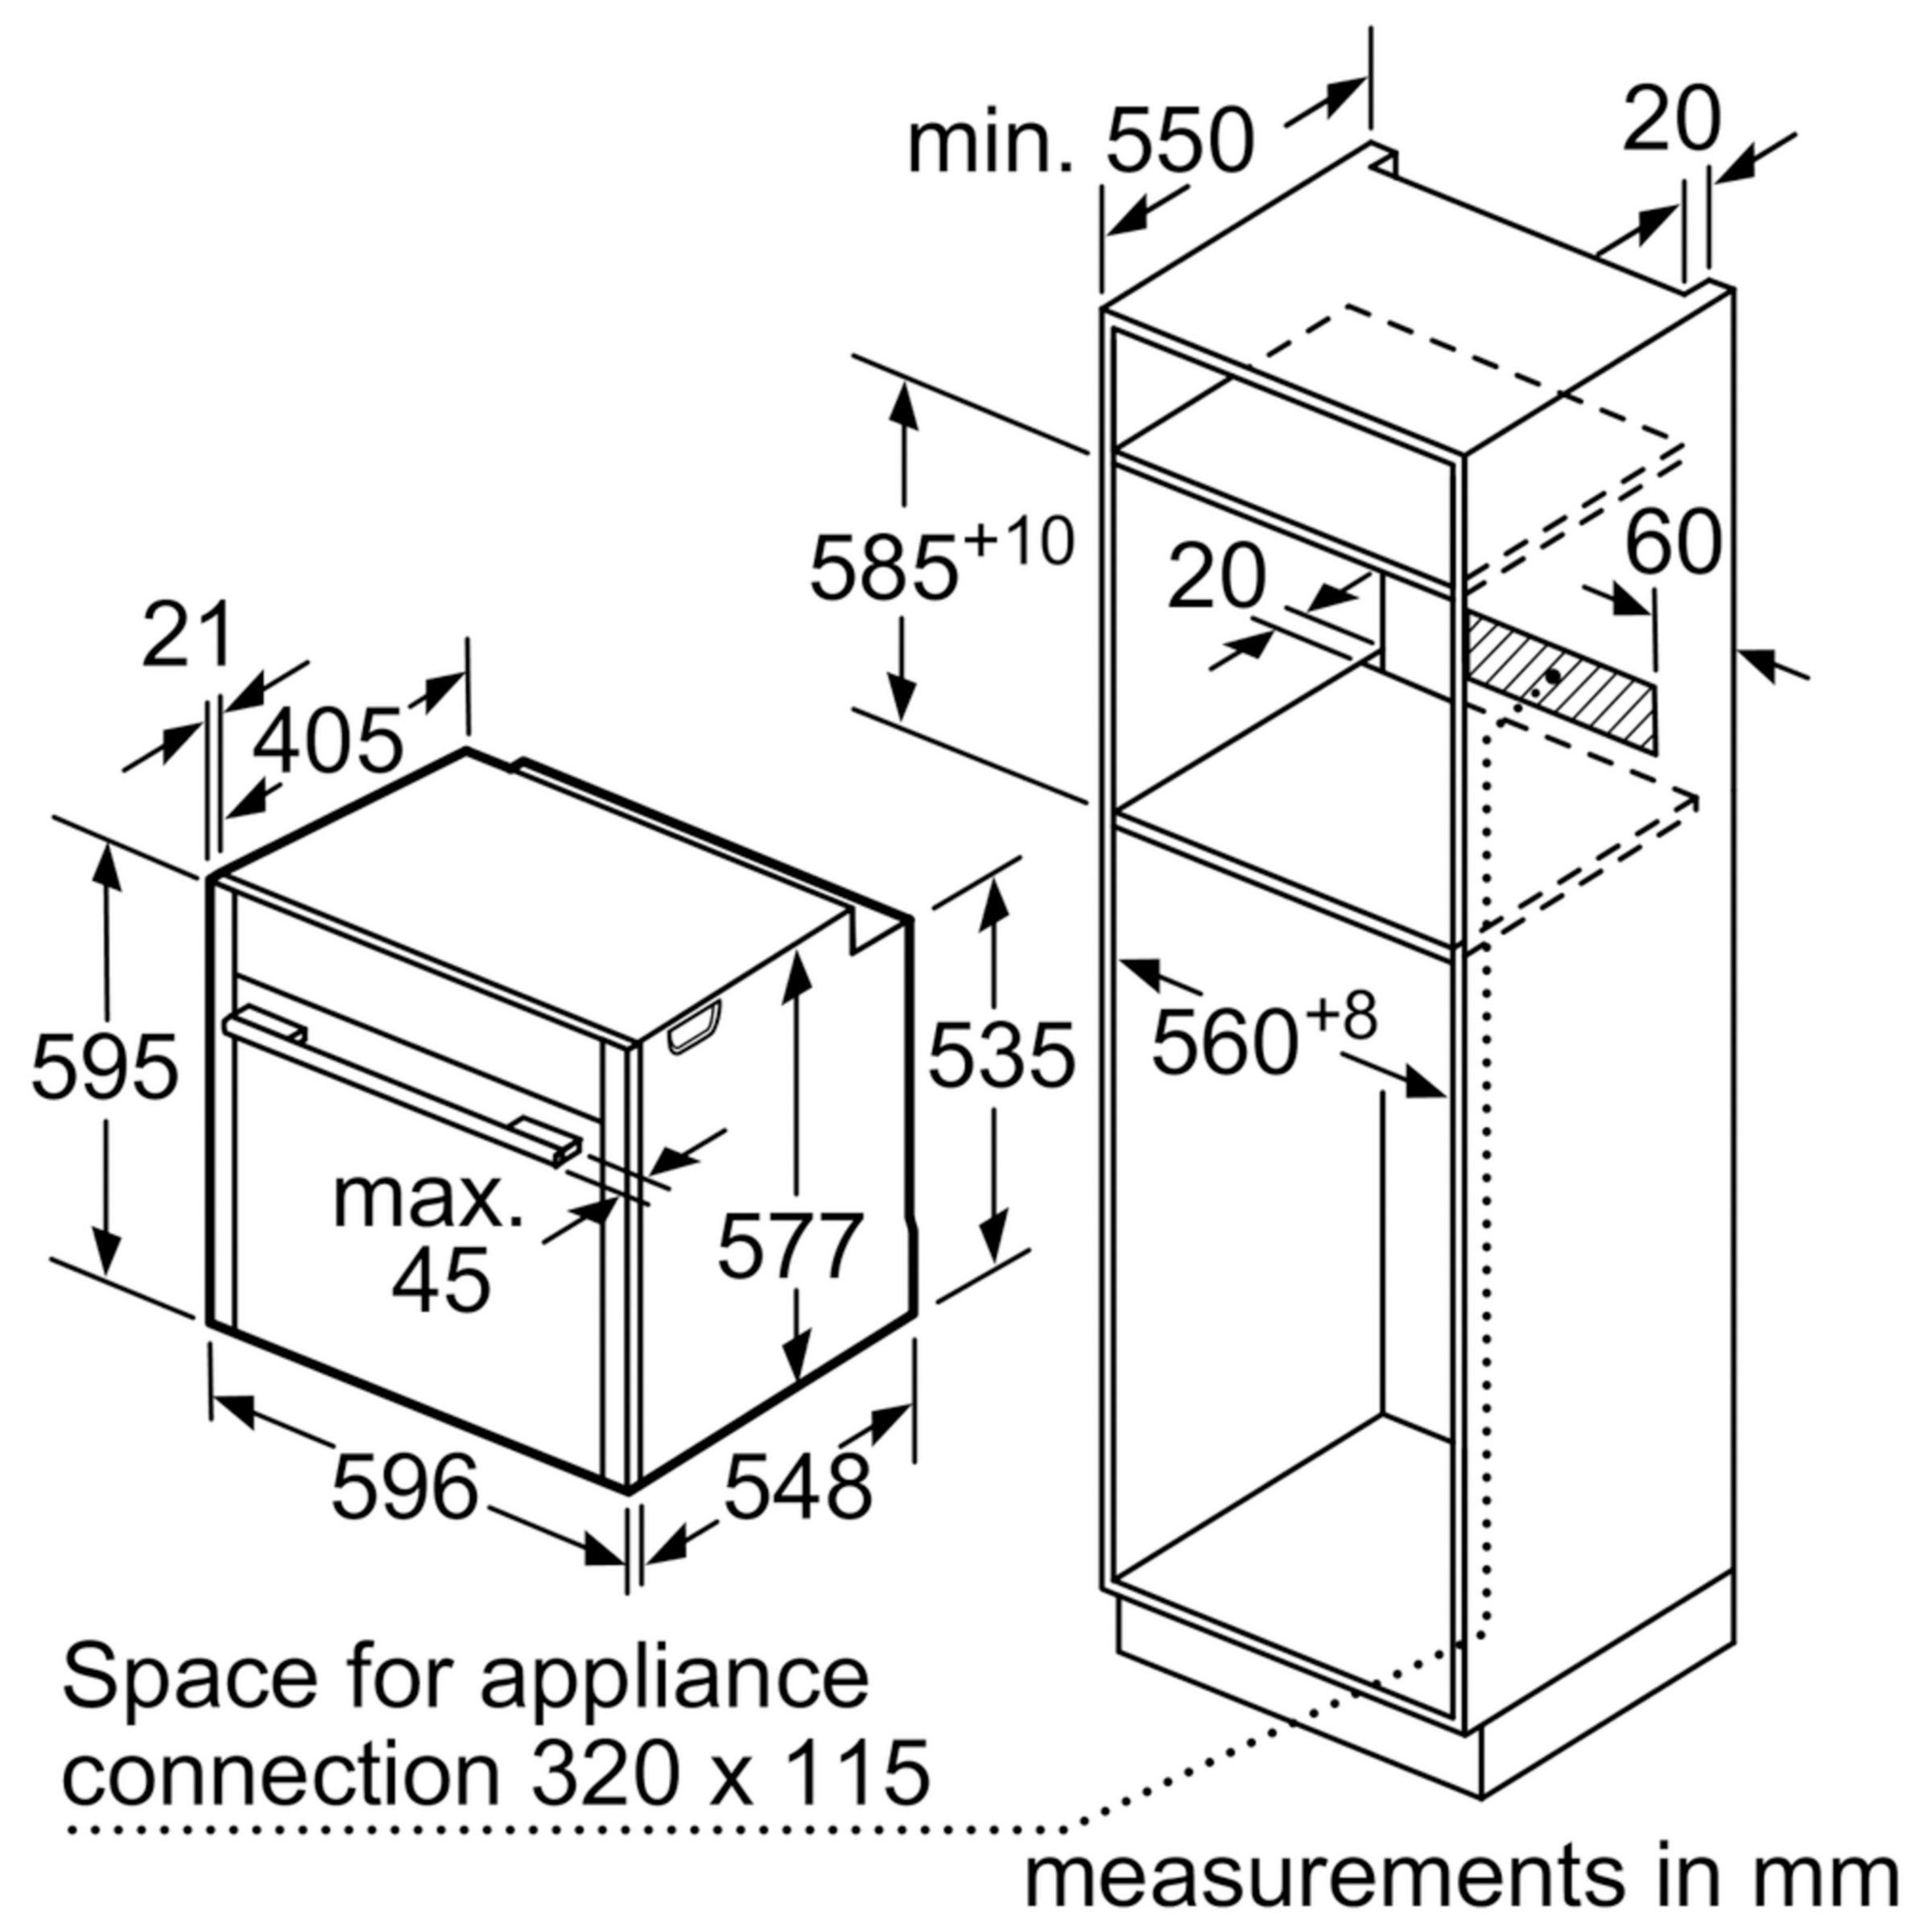 medium resolution of  buyneff b57vr22n0b slide and hide single electric oven stainless steel online at johnlewis com